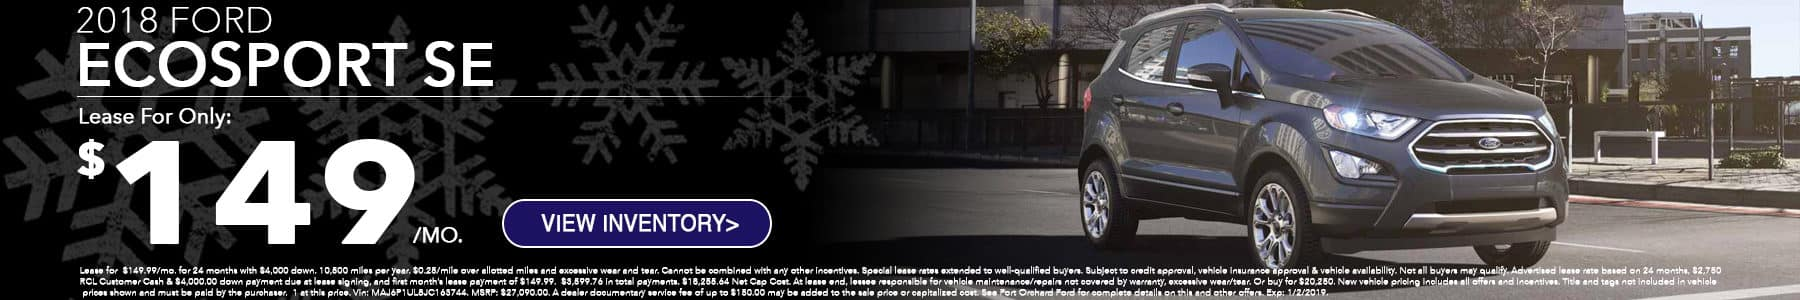 Ford Ecosport December Special